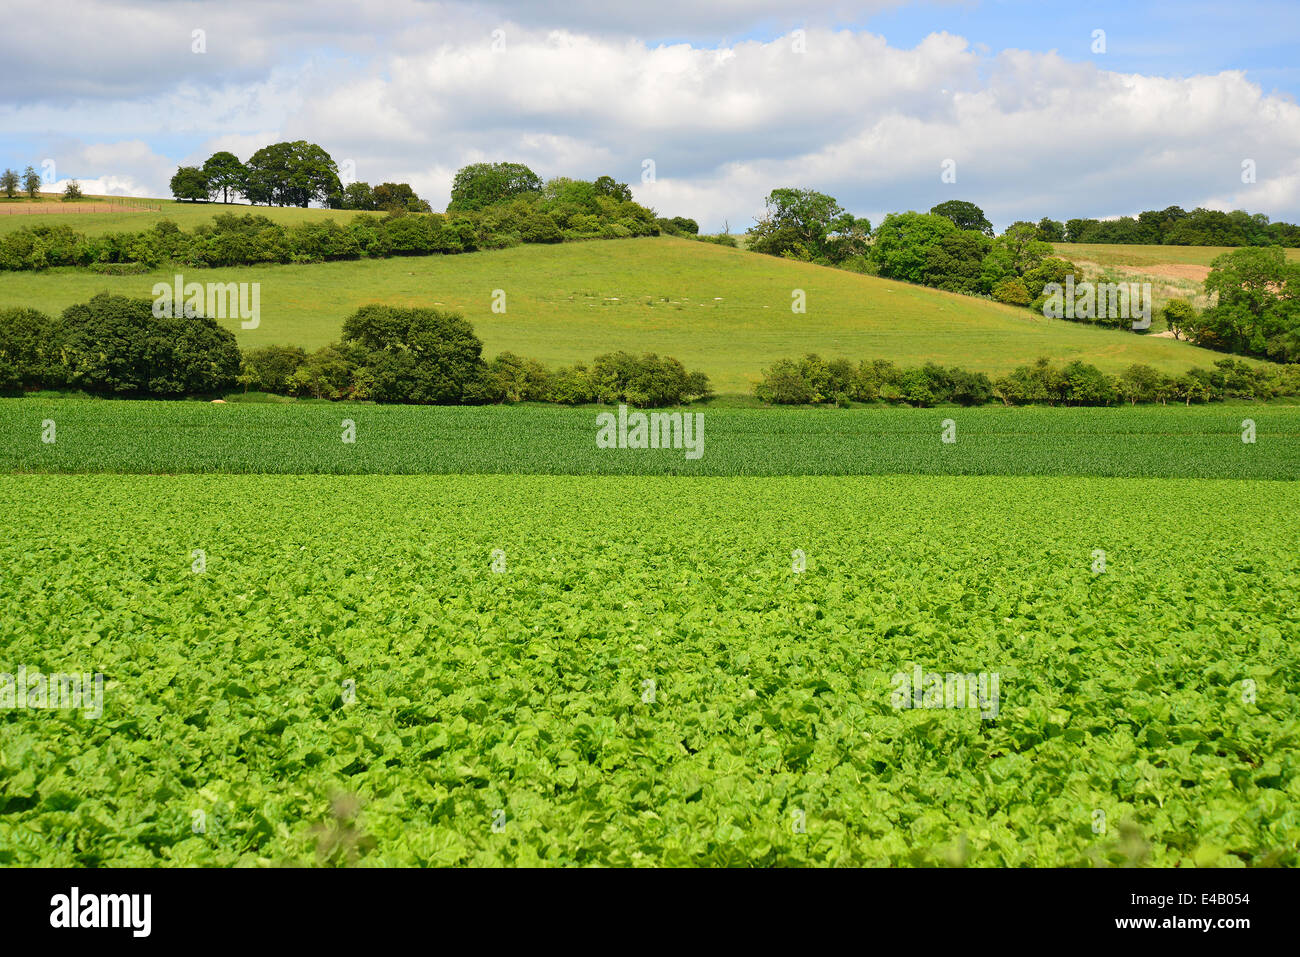 Green vegetables growing in field near Marlow, Buckinghamshire, England, United Kingdom - Stock Image